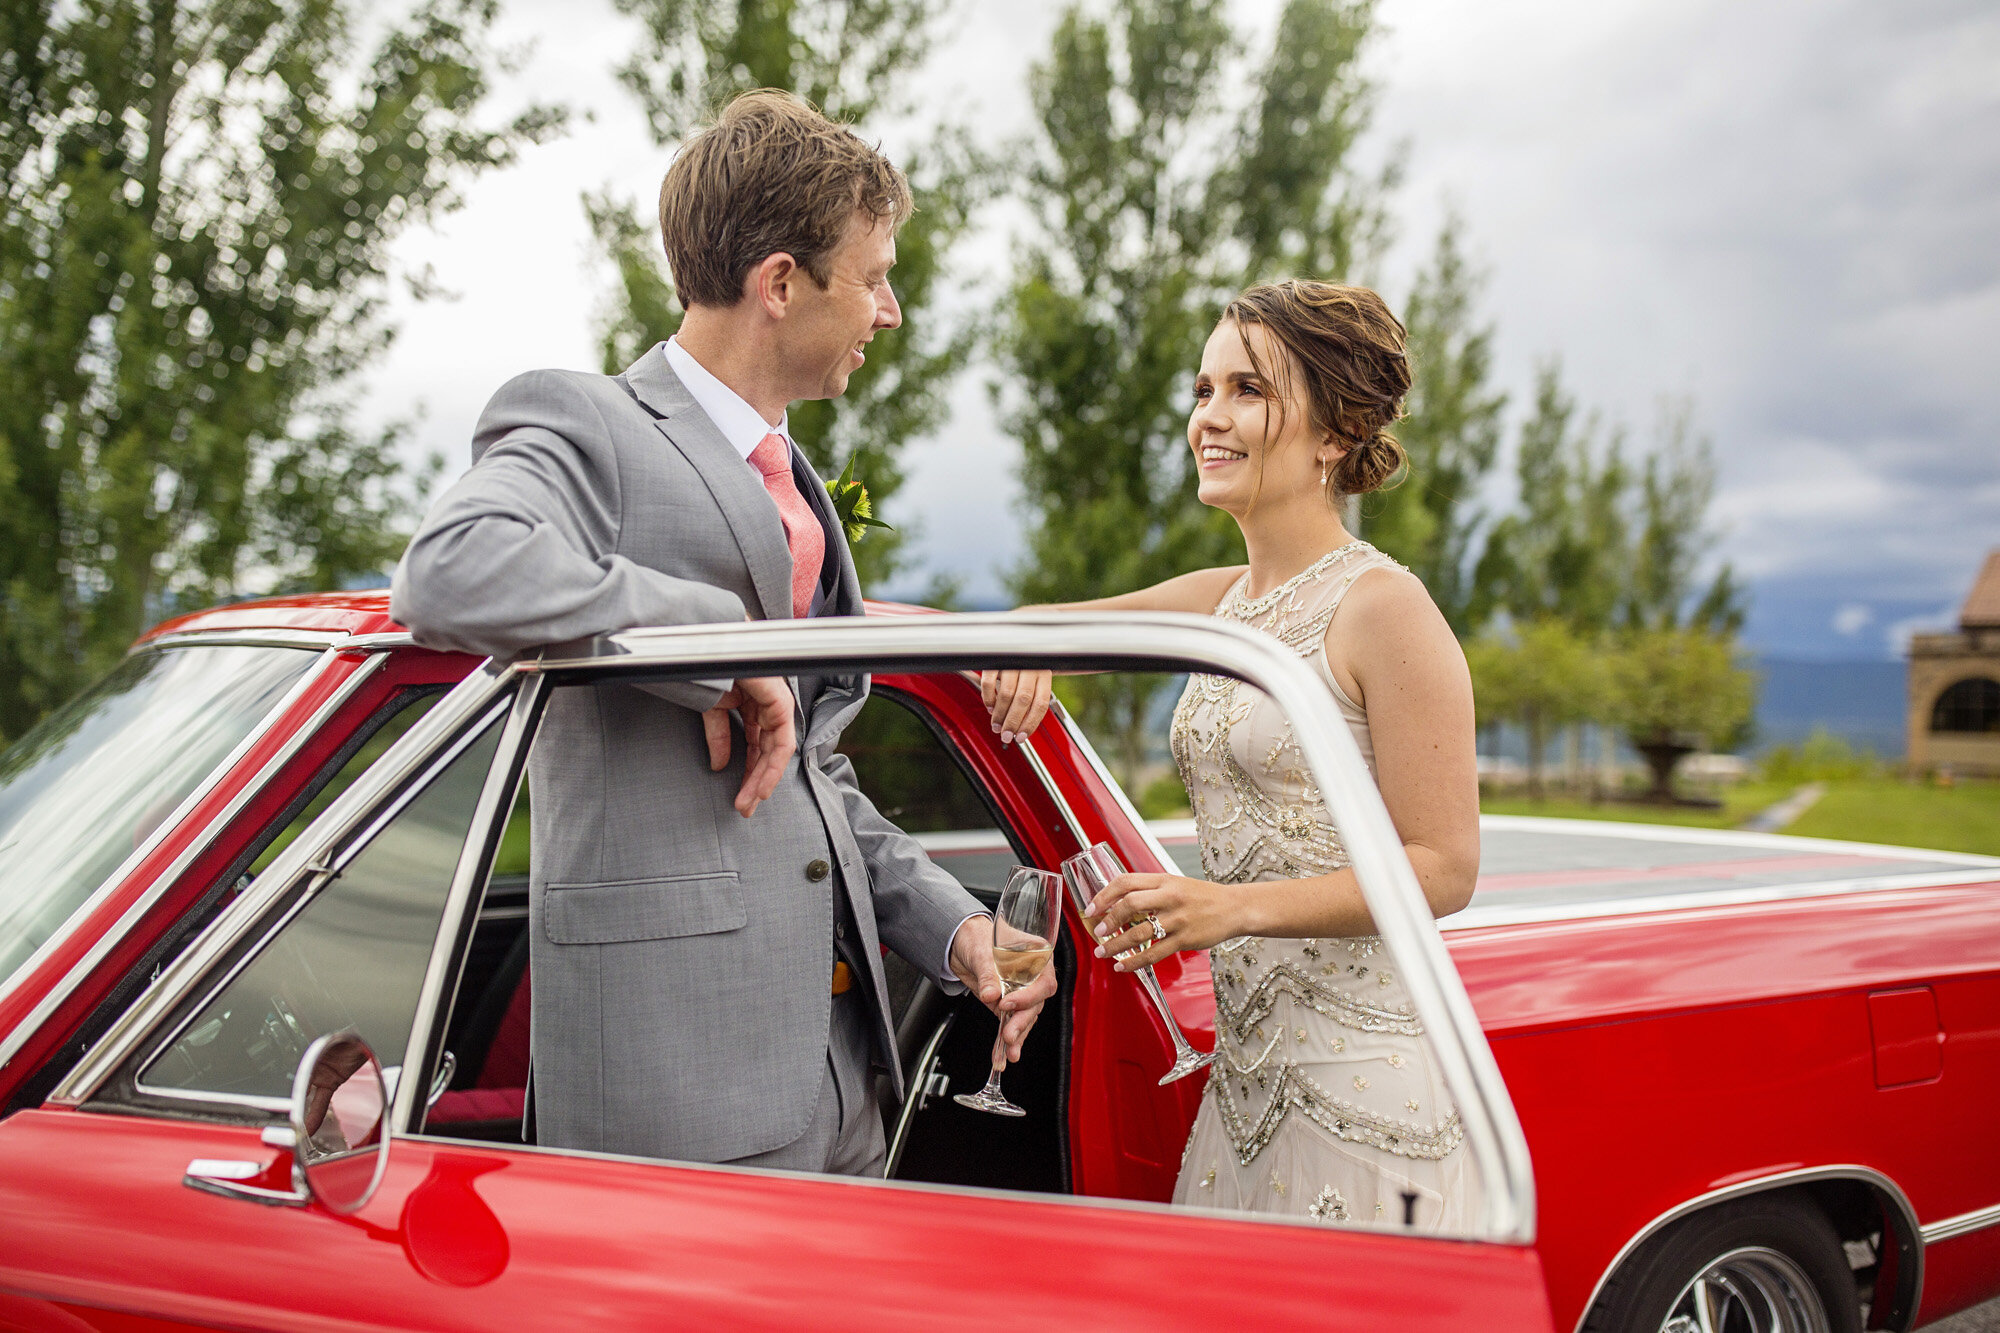 Seriously_Sabrina_Photography_Colorado_Springs_Club_at_Flying_Horse_Destination_Wedding_ODwyer74.jpg